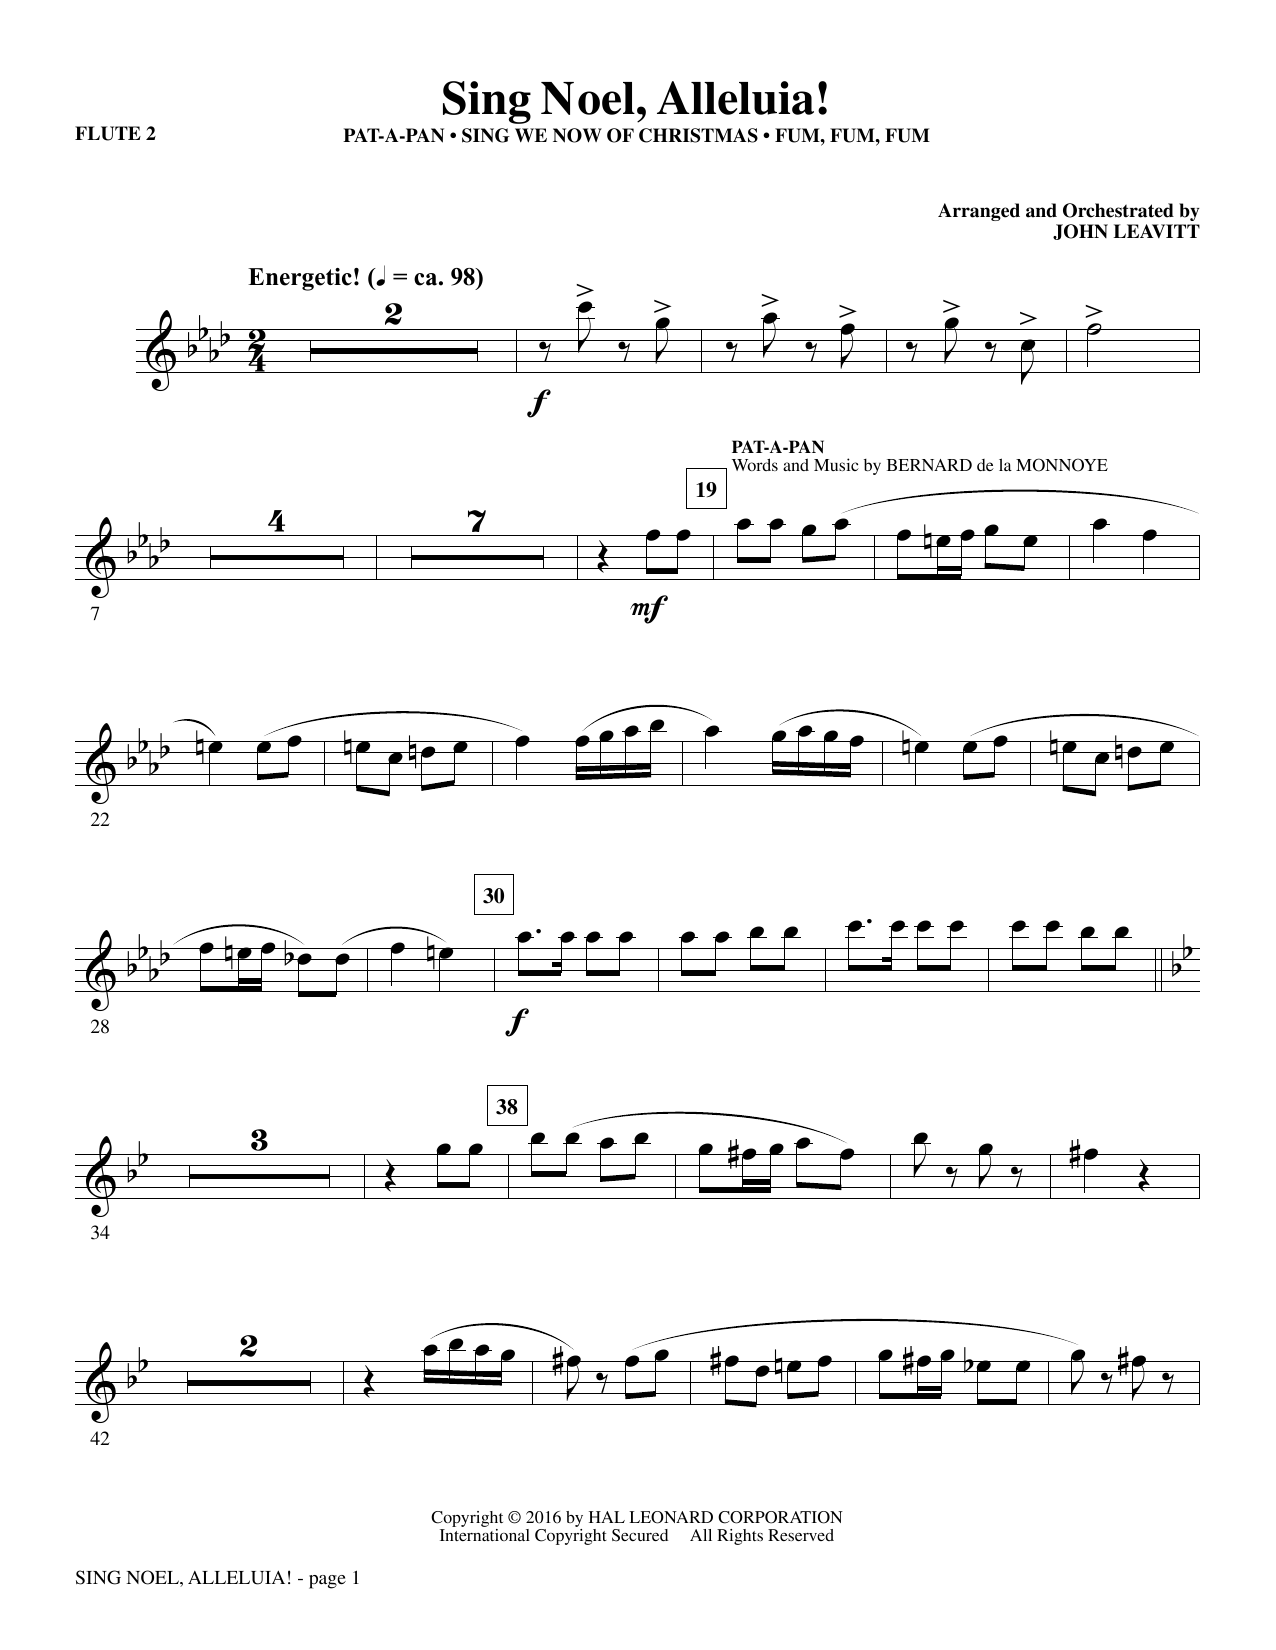 Sing Noel, Alleluia! - Flute 2 by John Leavitt Choral Instrumental Pak  Digital Sheet Music